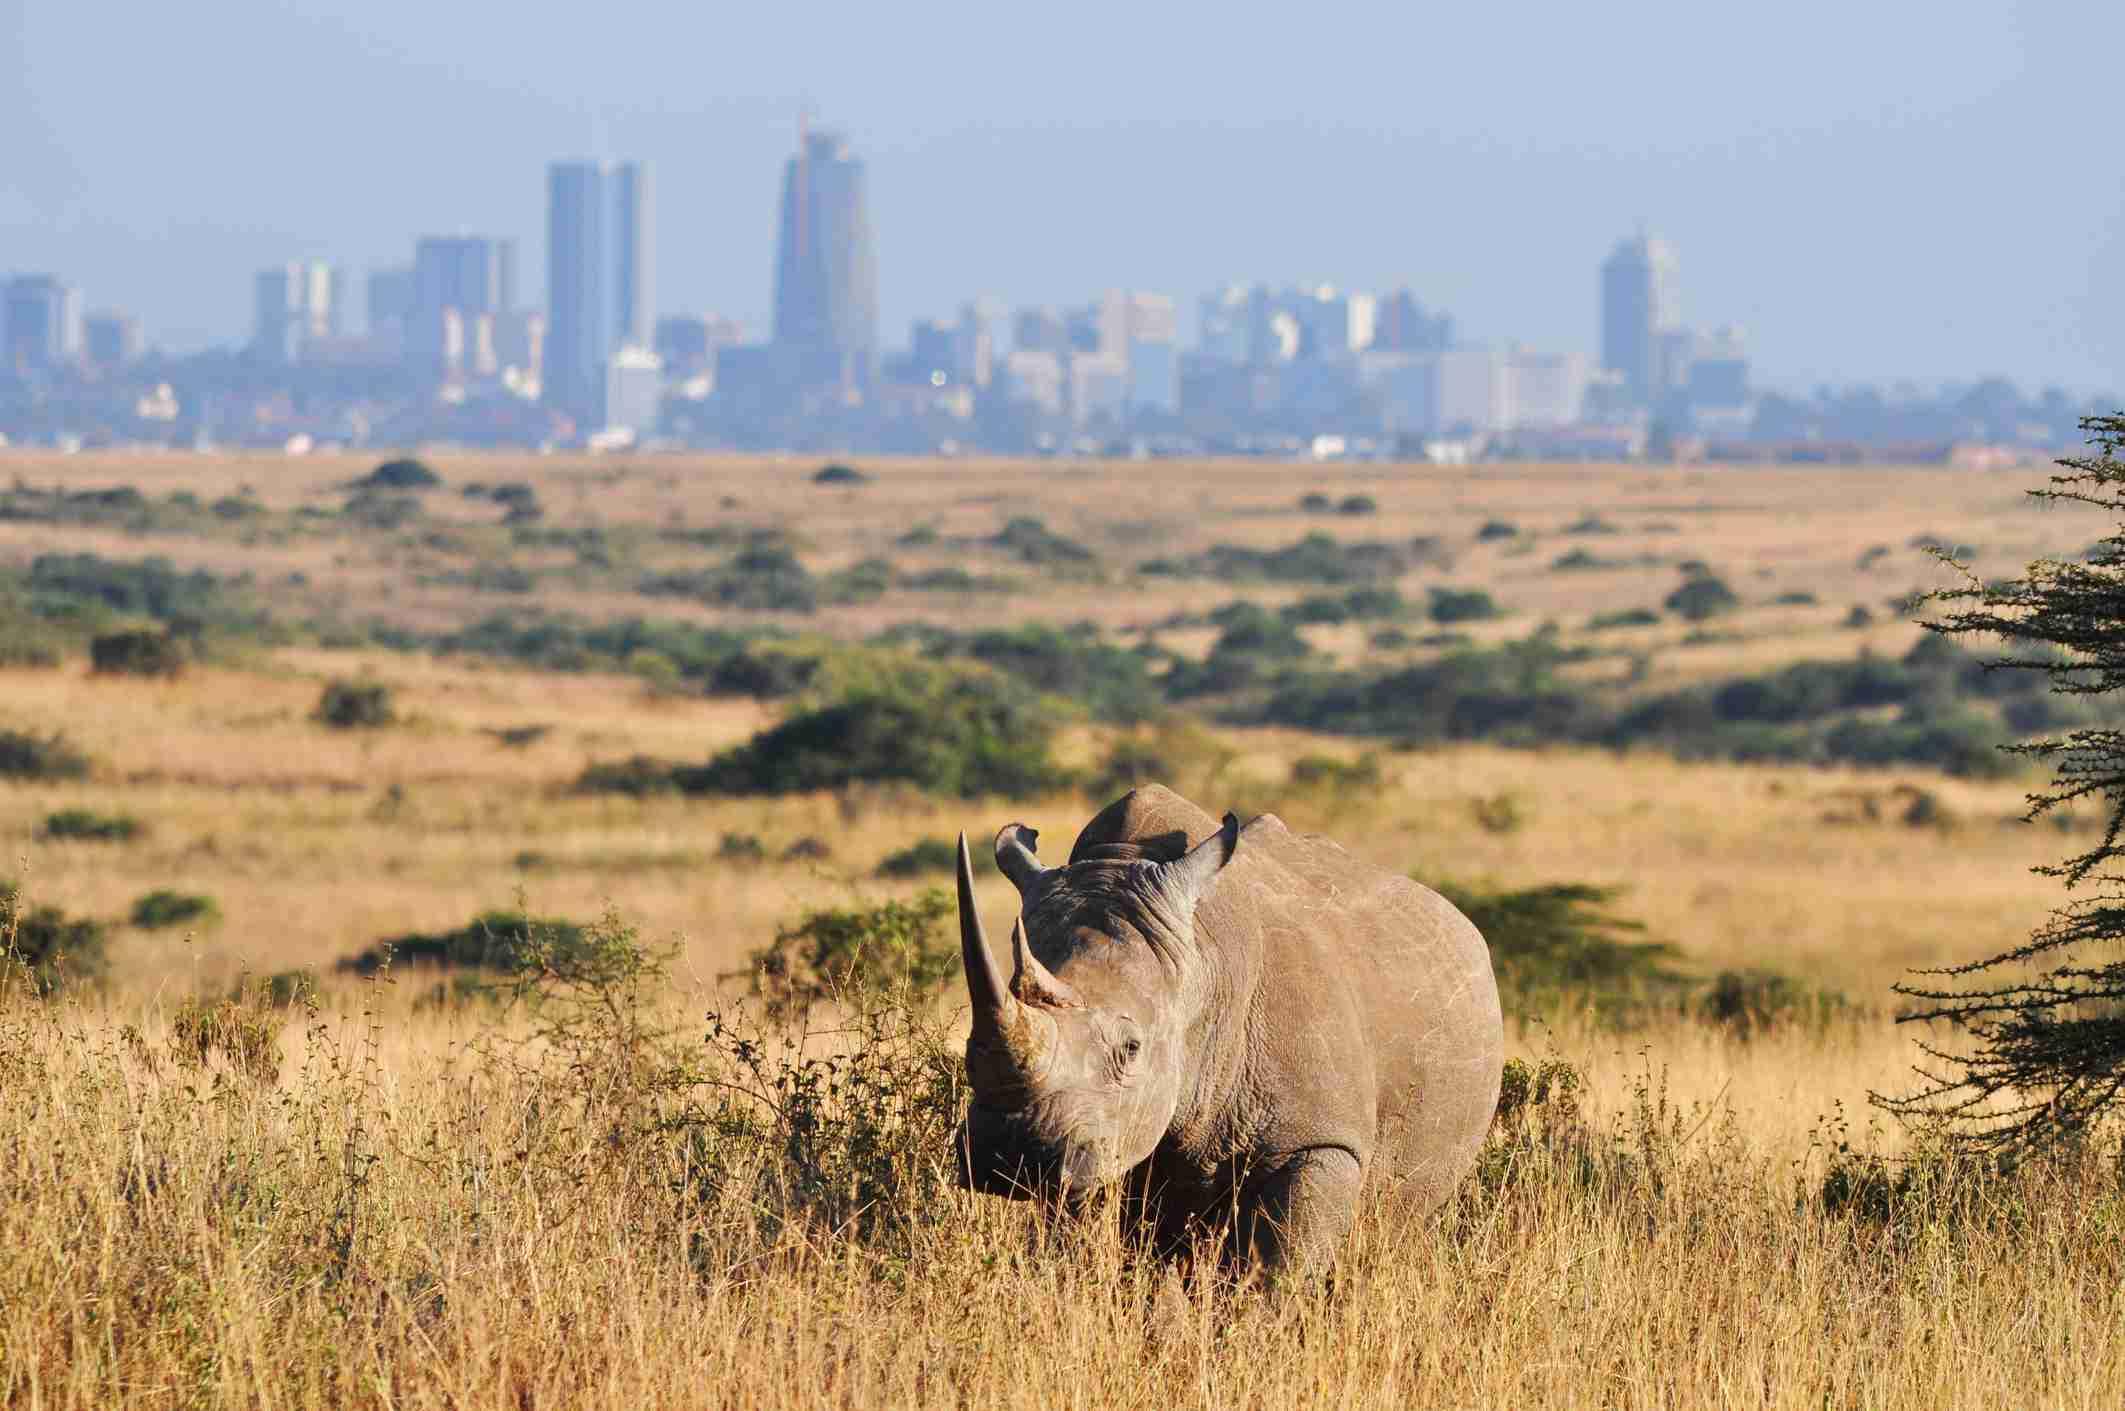 White rhino against an urban backdrop in Nairobi National Park, Kenya